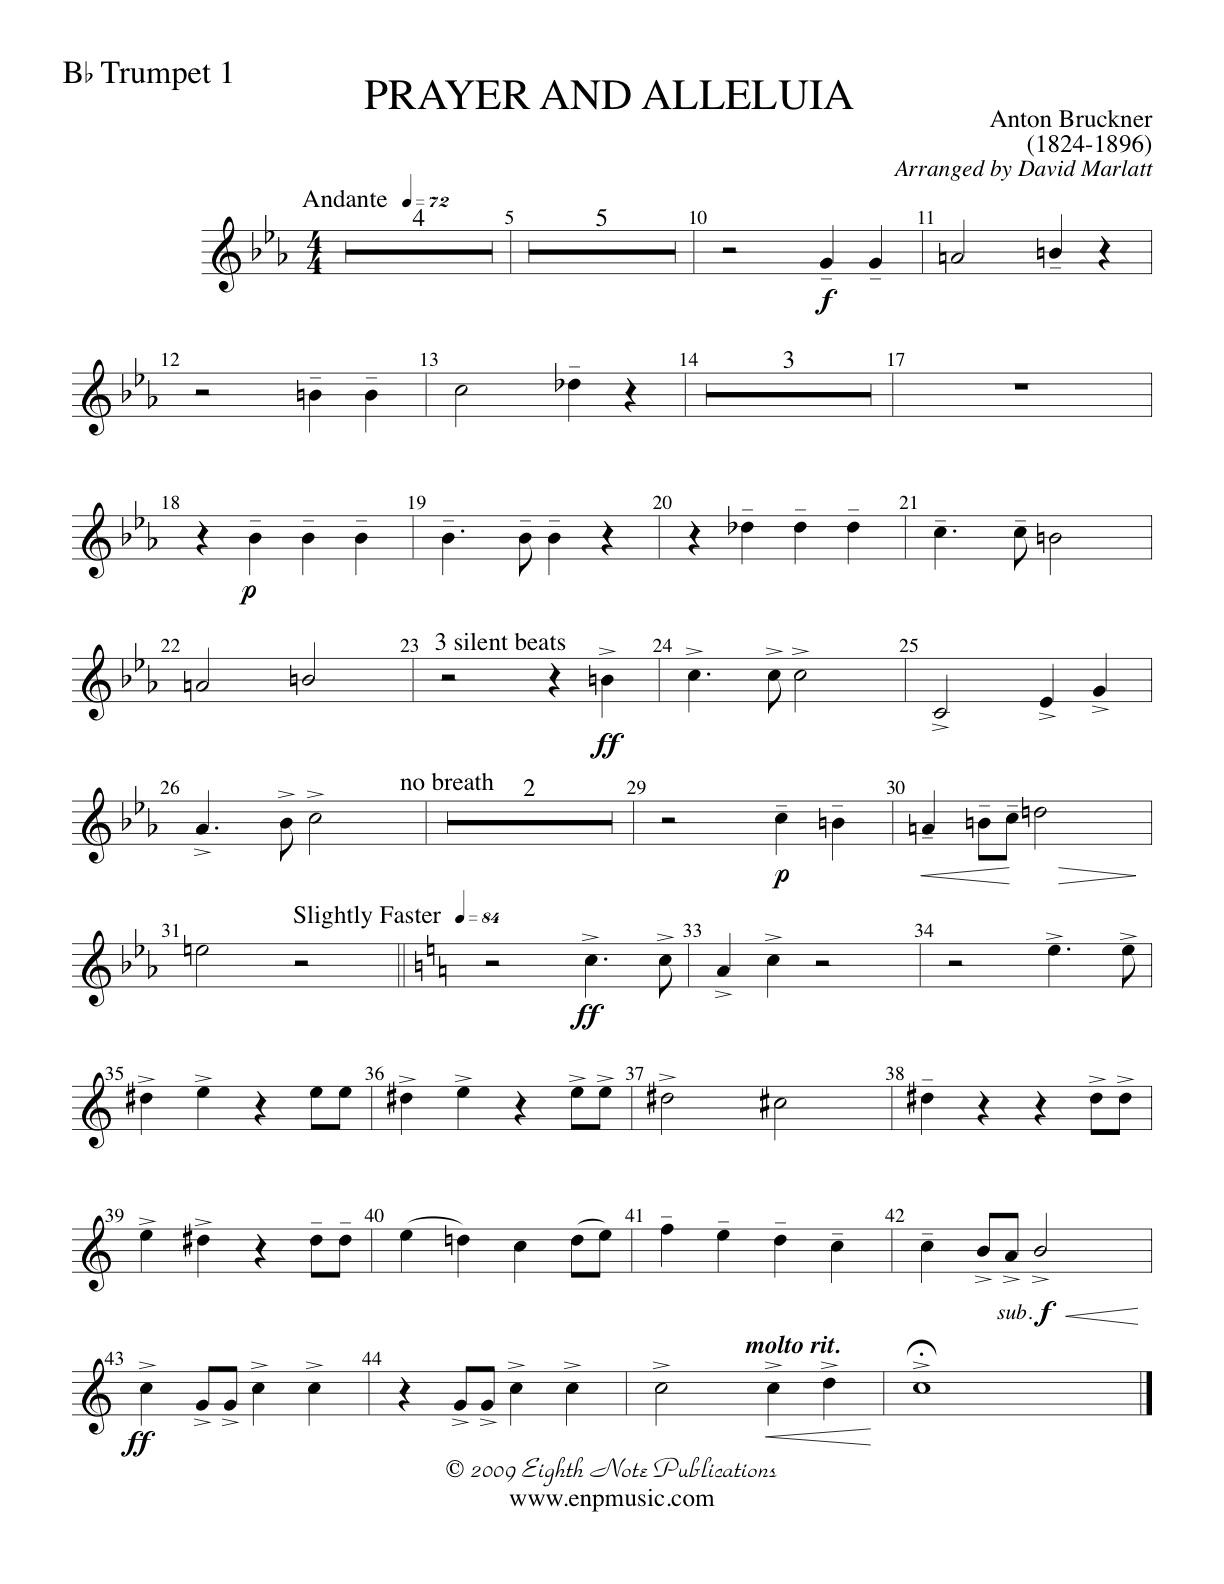 Prayer and Alleluia - Anton Bruckner